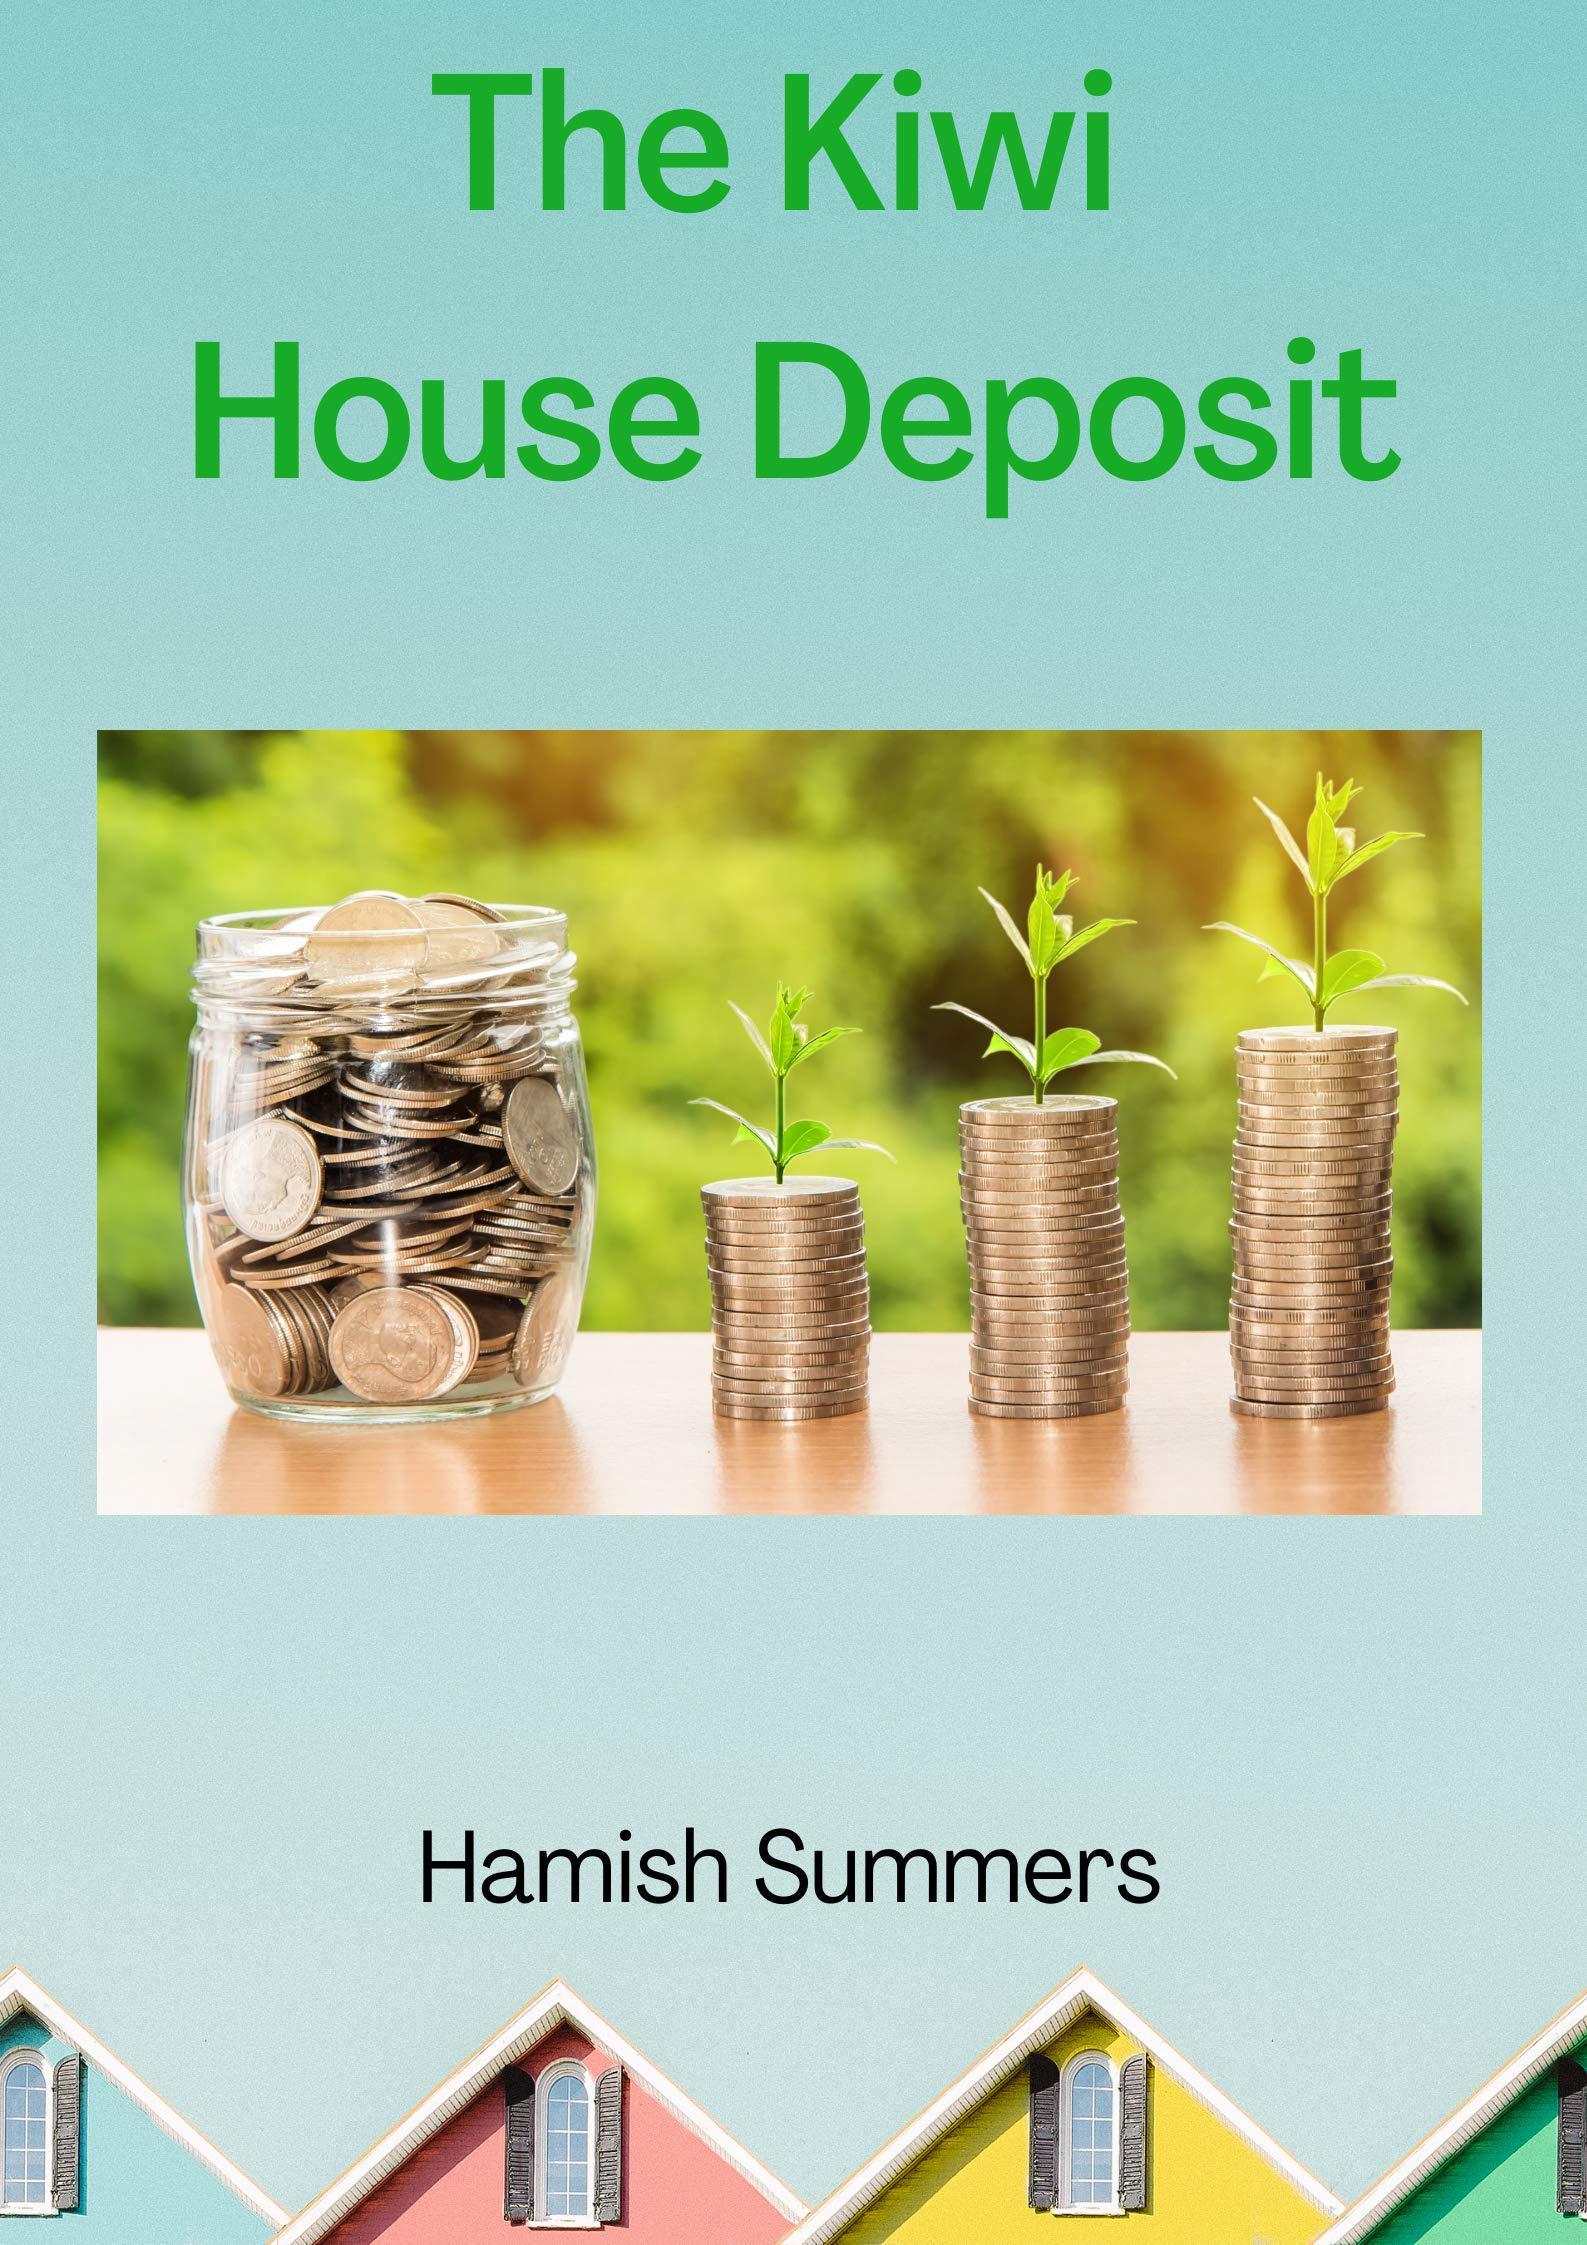 The Kiwi House Deposit